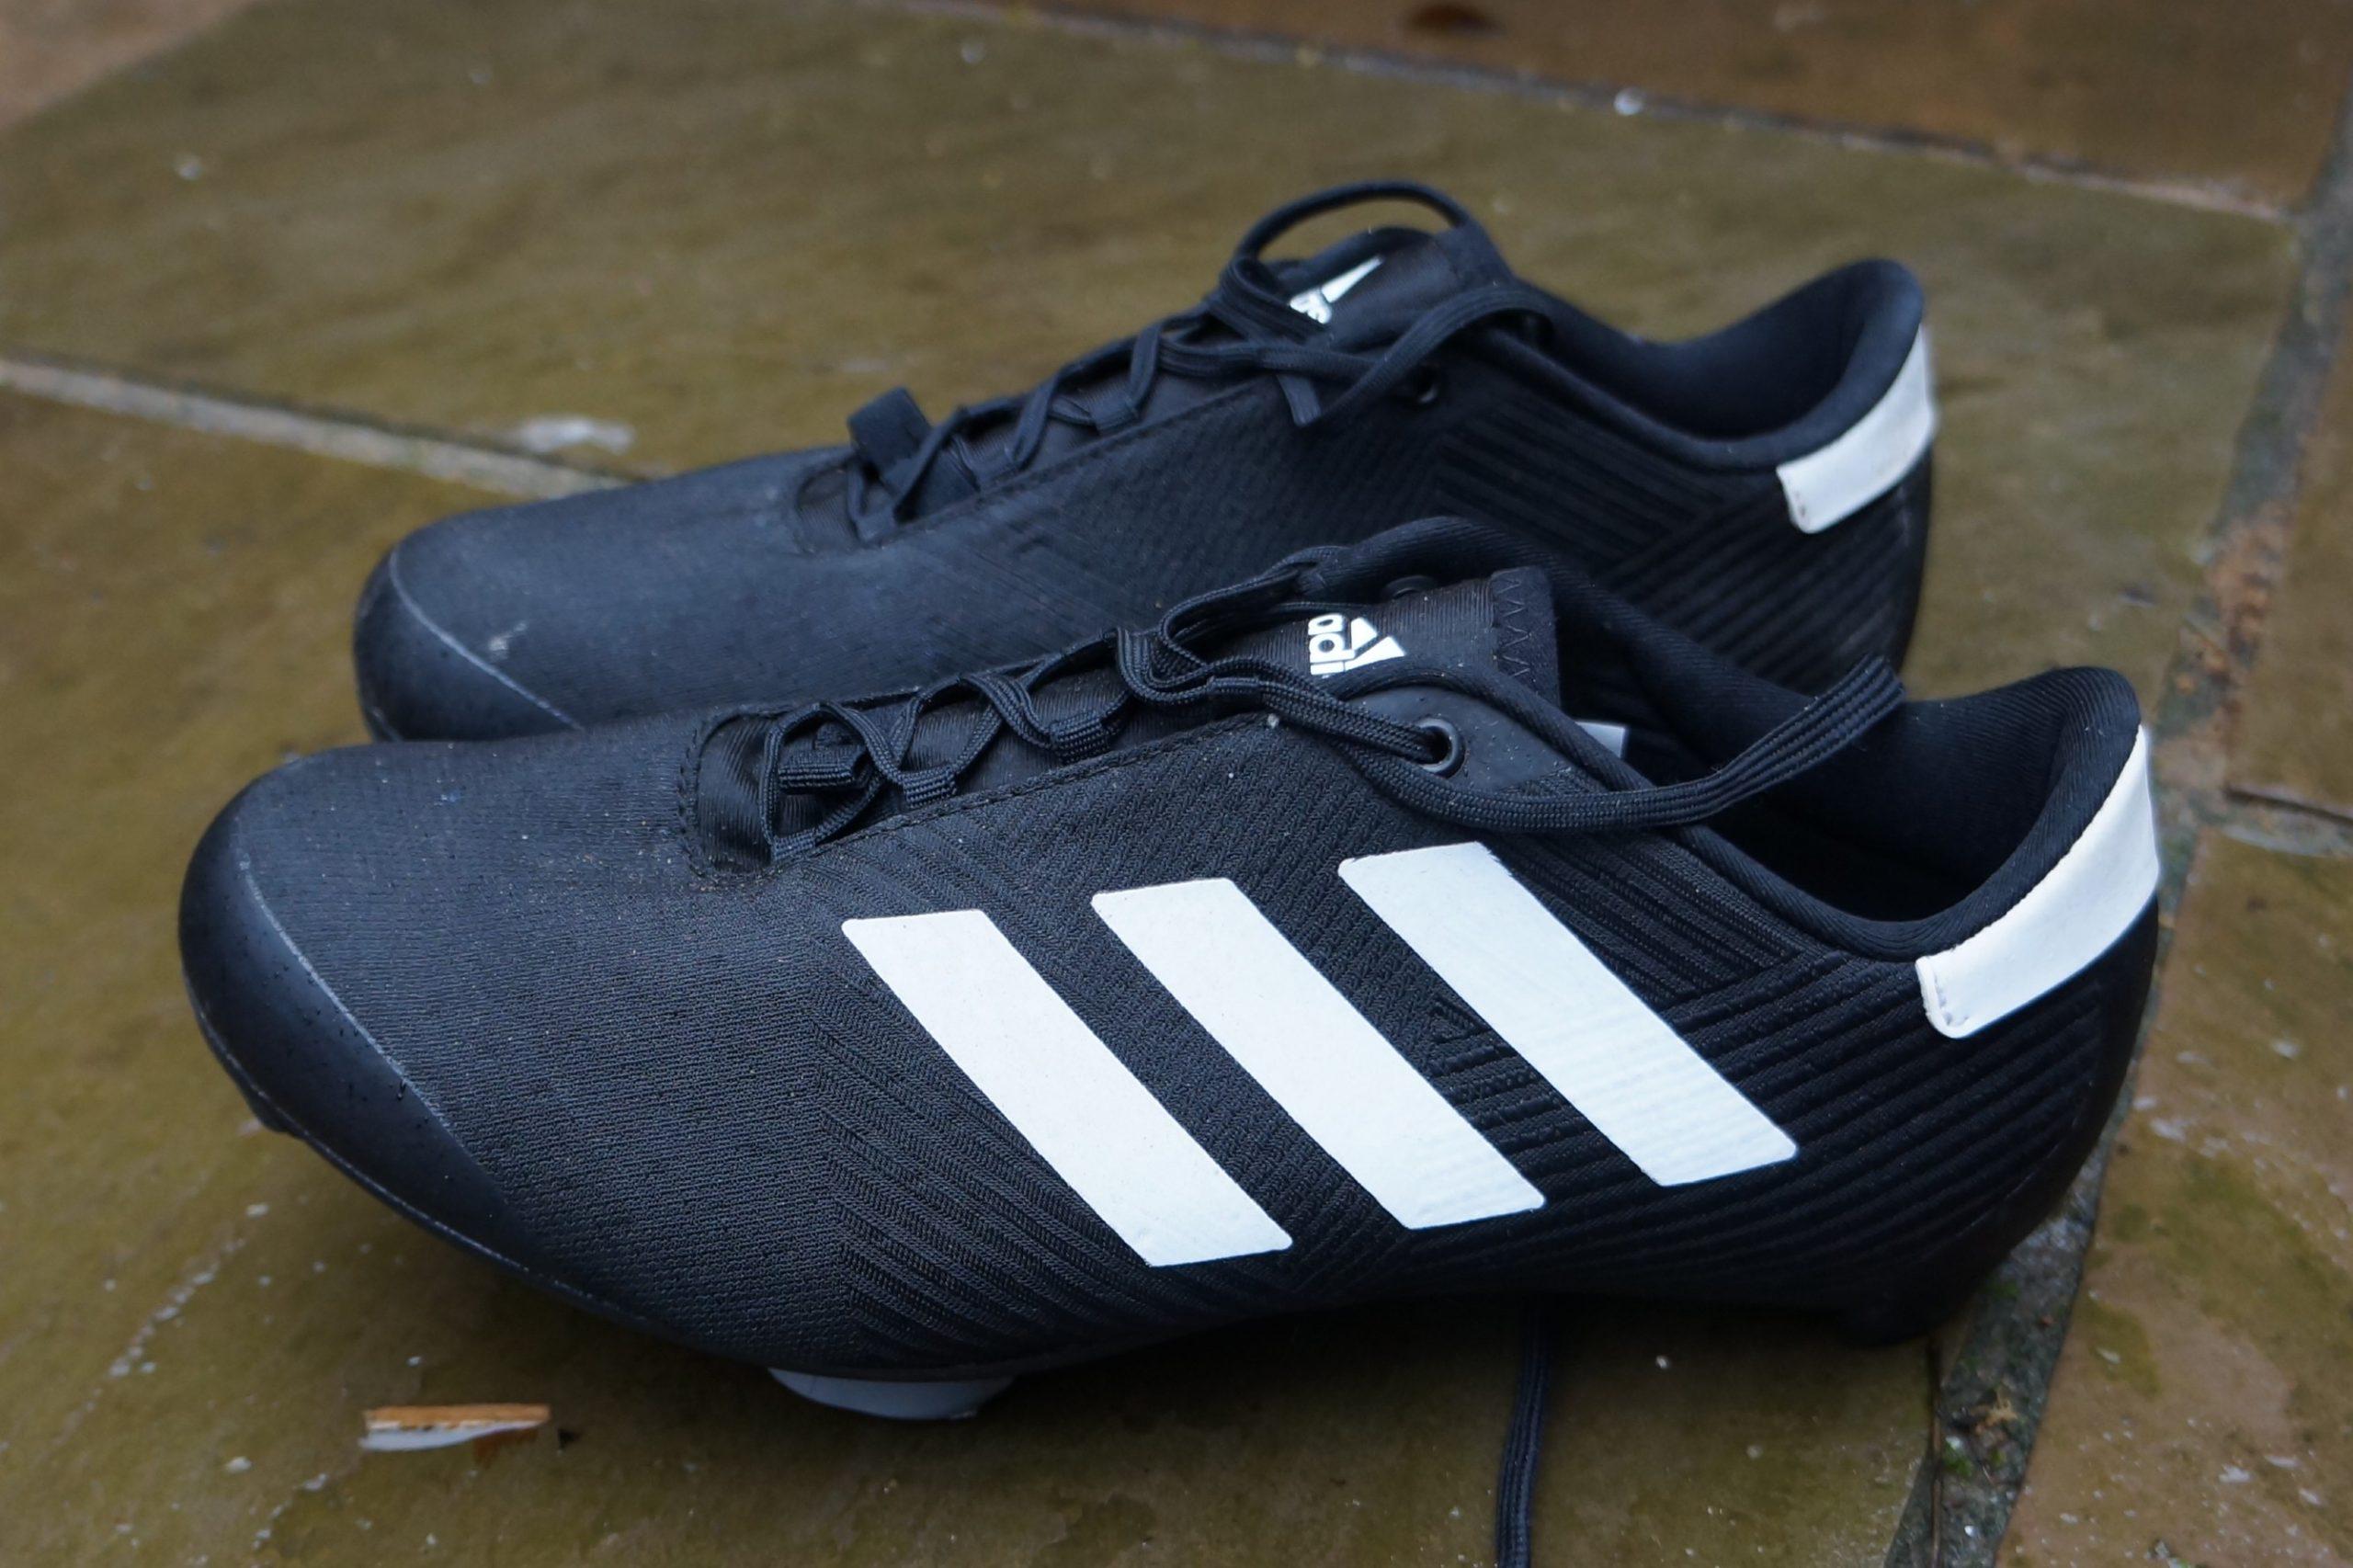 Adidas Road Shoes | Cycling Weekly